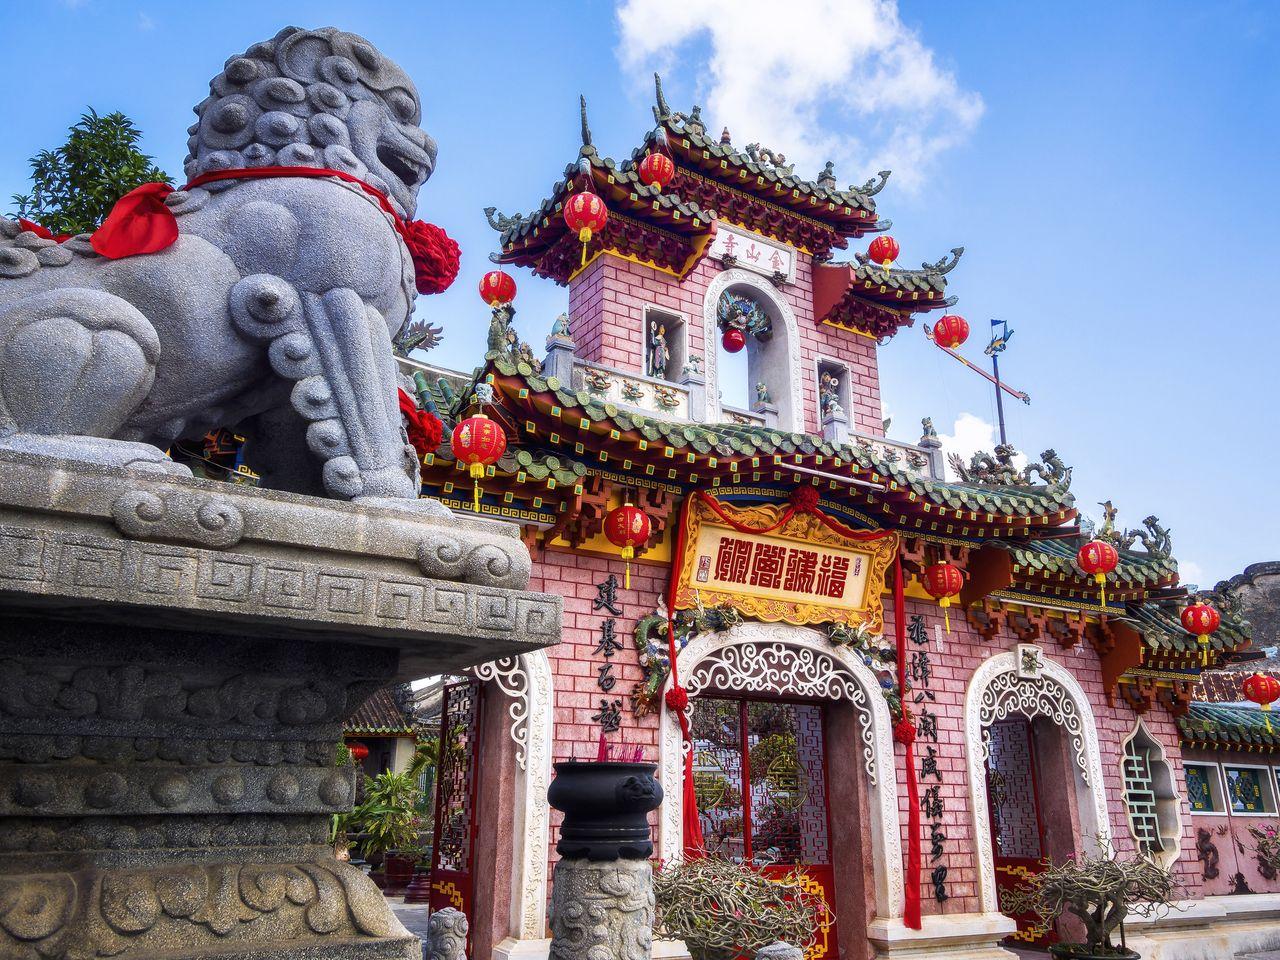 Fujian Assembly Hall in Hoi An, Vietnam